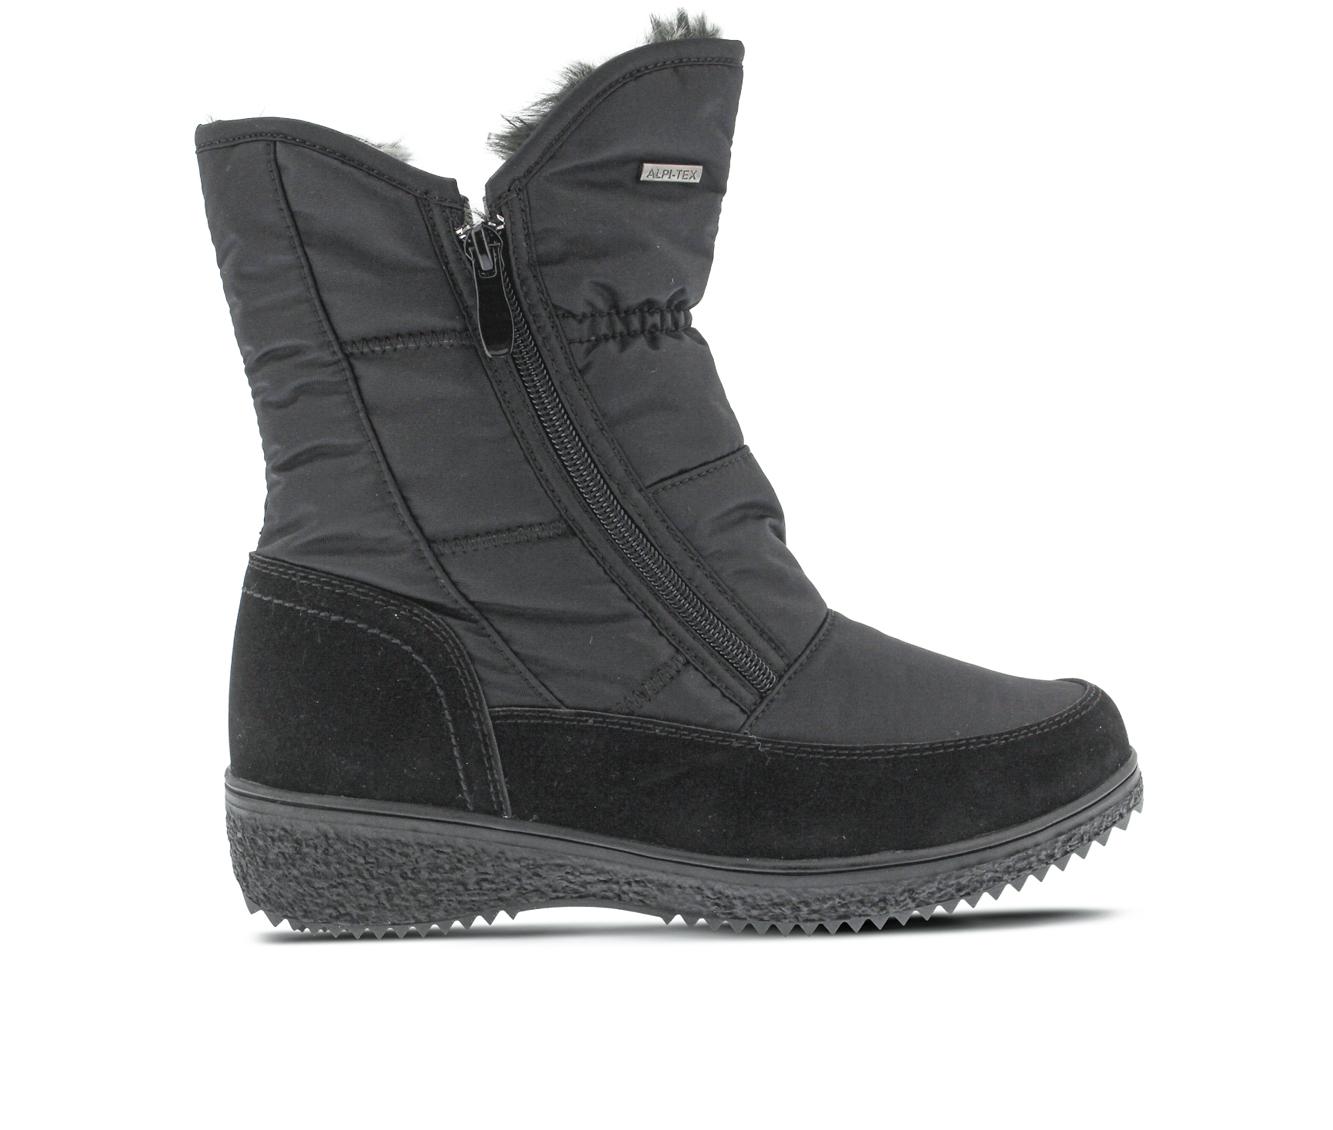 Flexus Ernestina Women's Boots (Black Canvas)